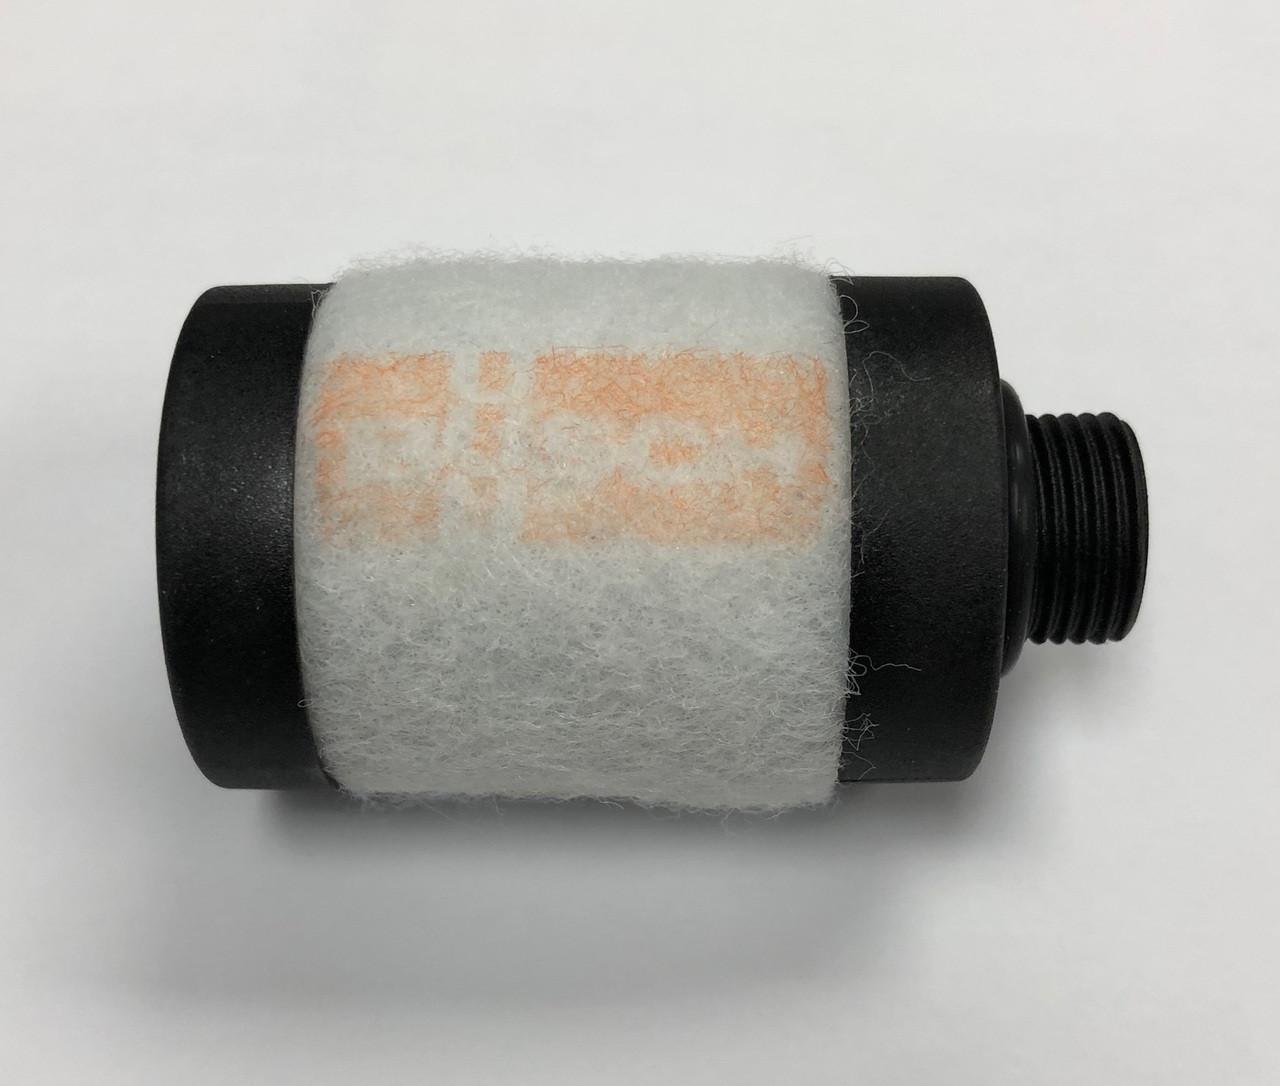 Exhaust Filter MiniPack MVS-31 - MiniPack America Parts (2 Sizes)